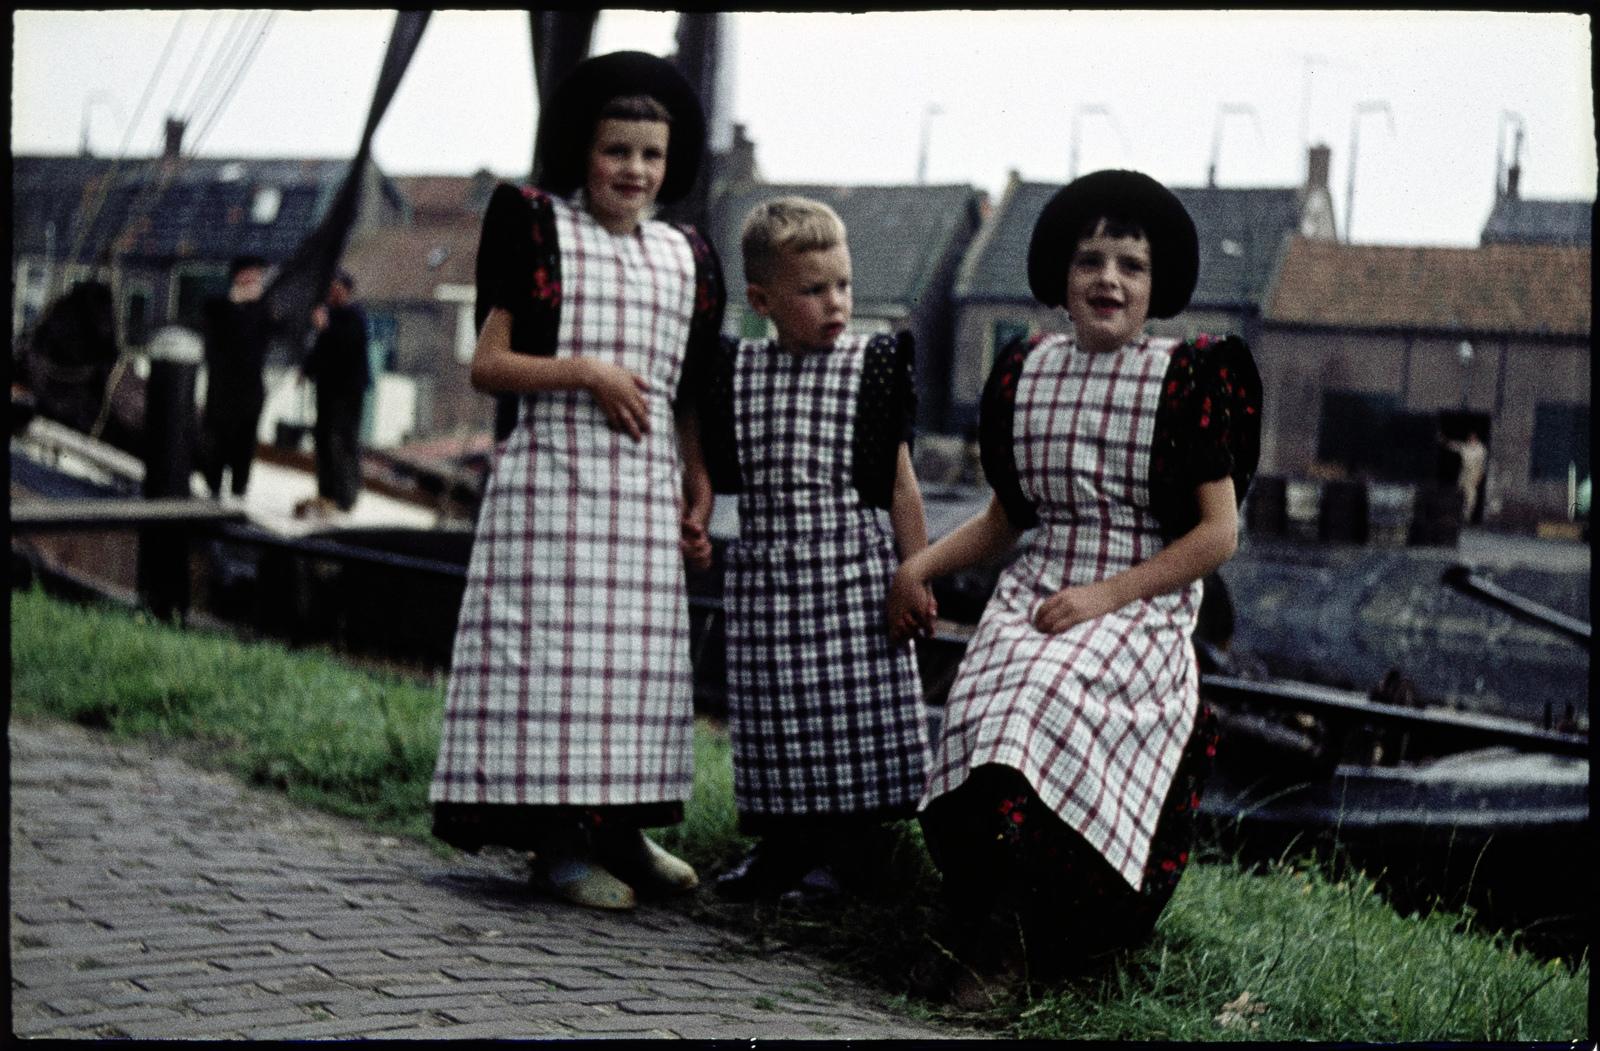 Drie kinderen in klederdracht